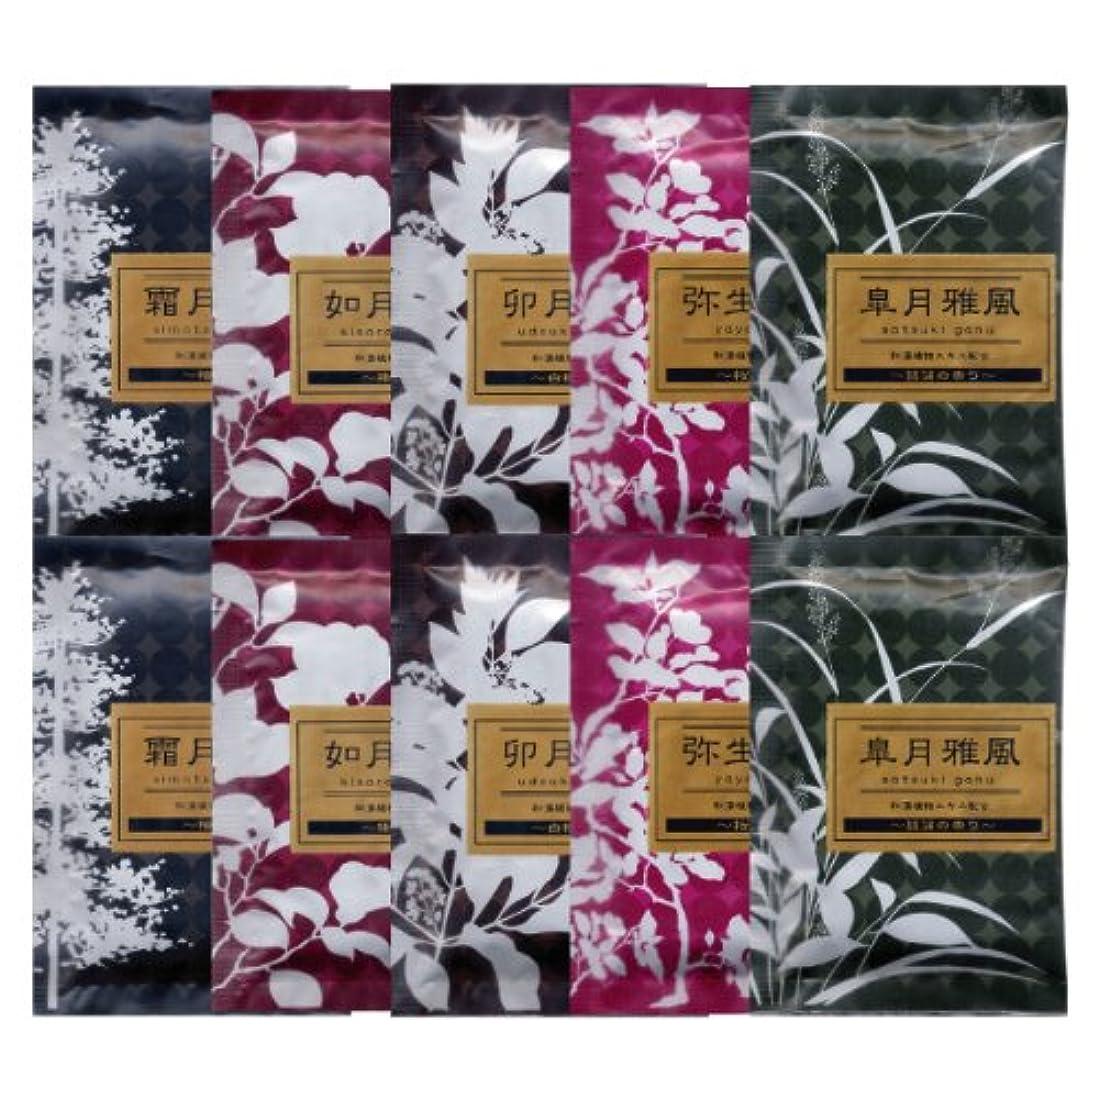 海嶺子孫メタン薬用入浴剤 綺羅の刻 5種類×2 10包